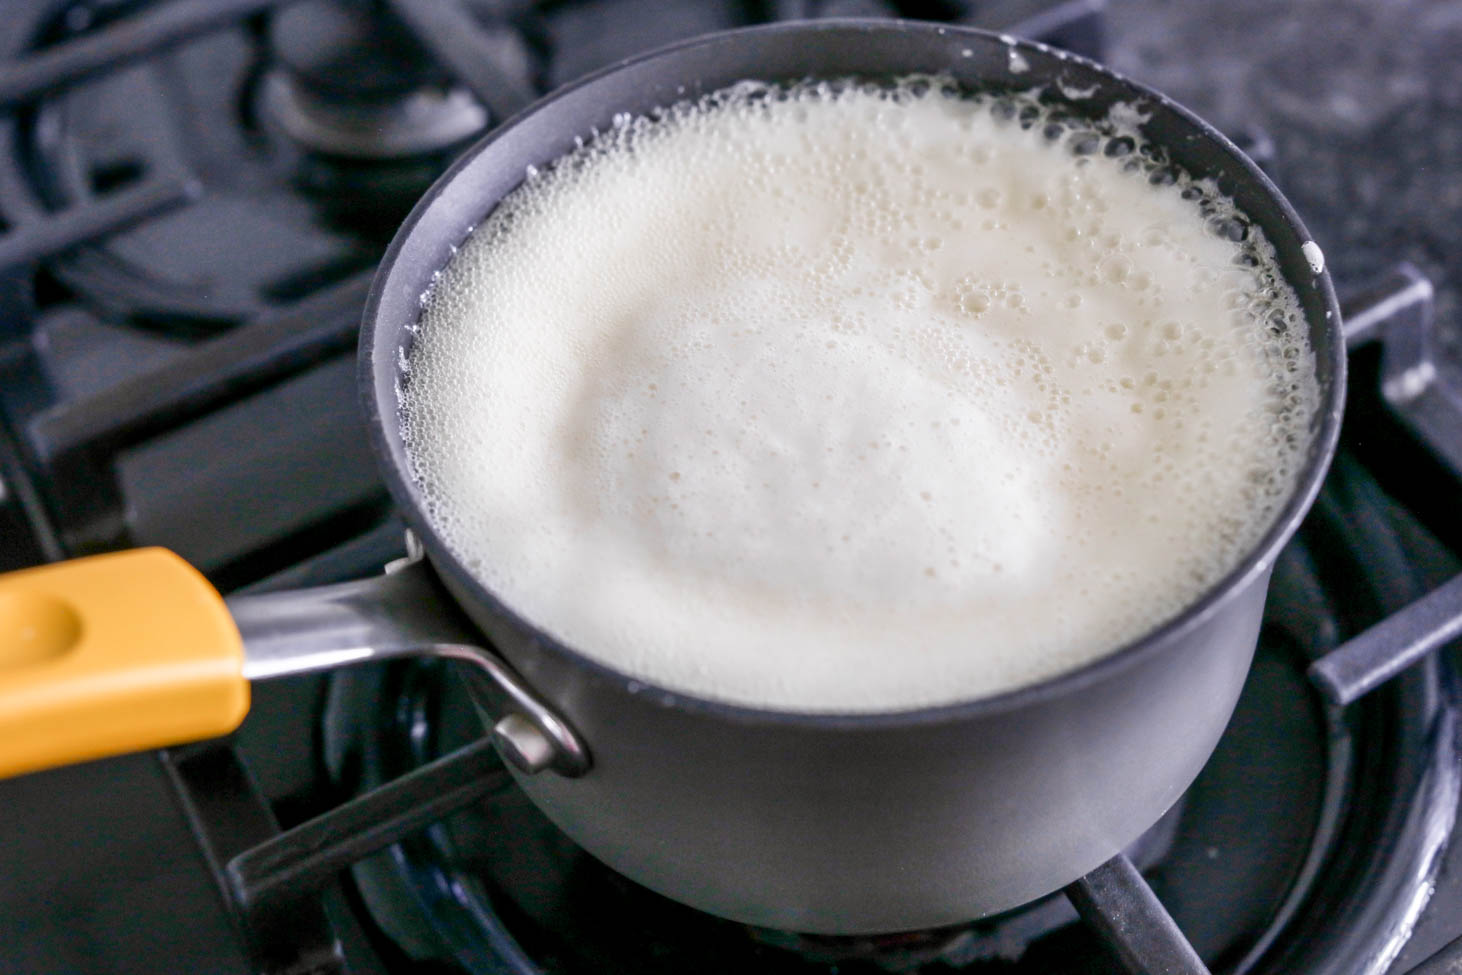 Homemade buttermilk syrup in a saucepan